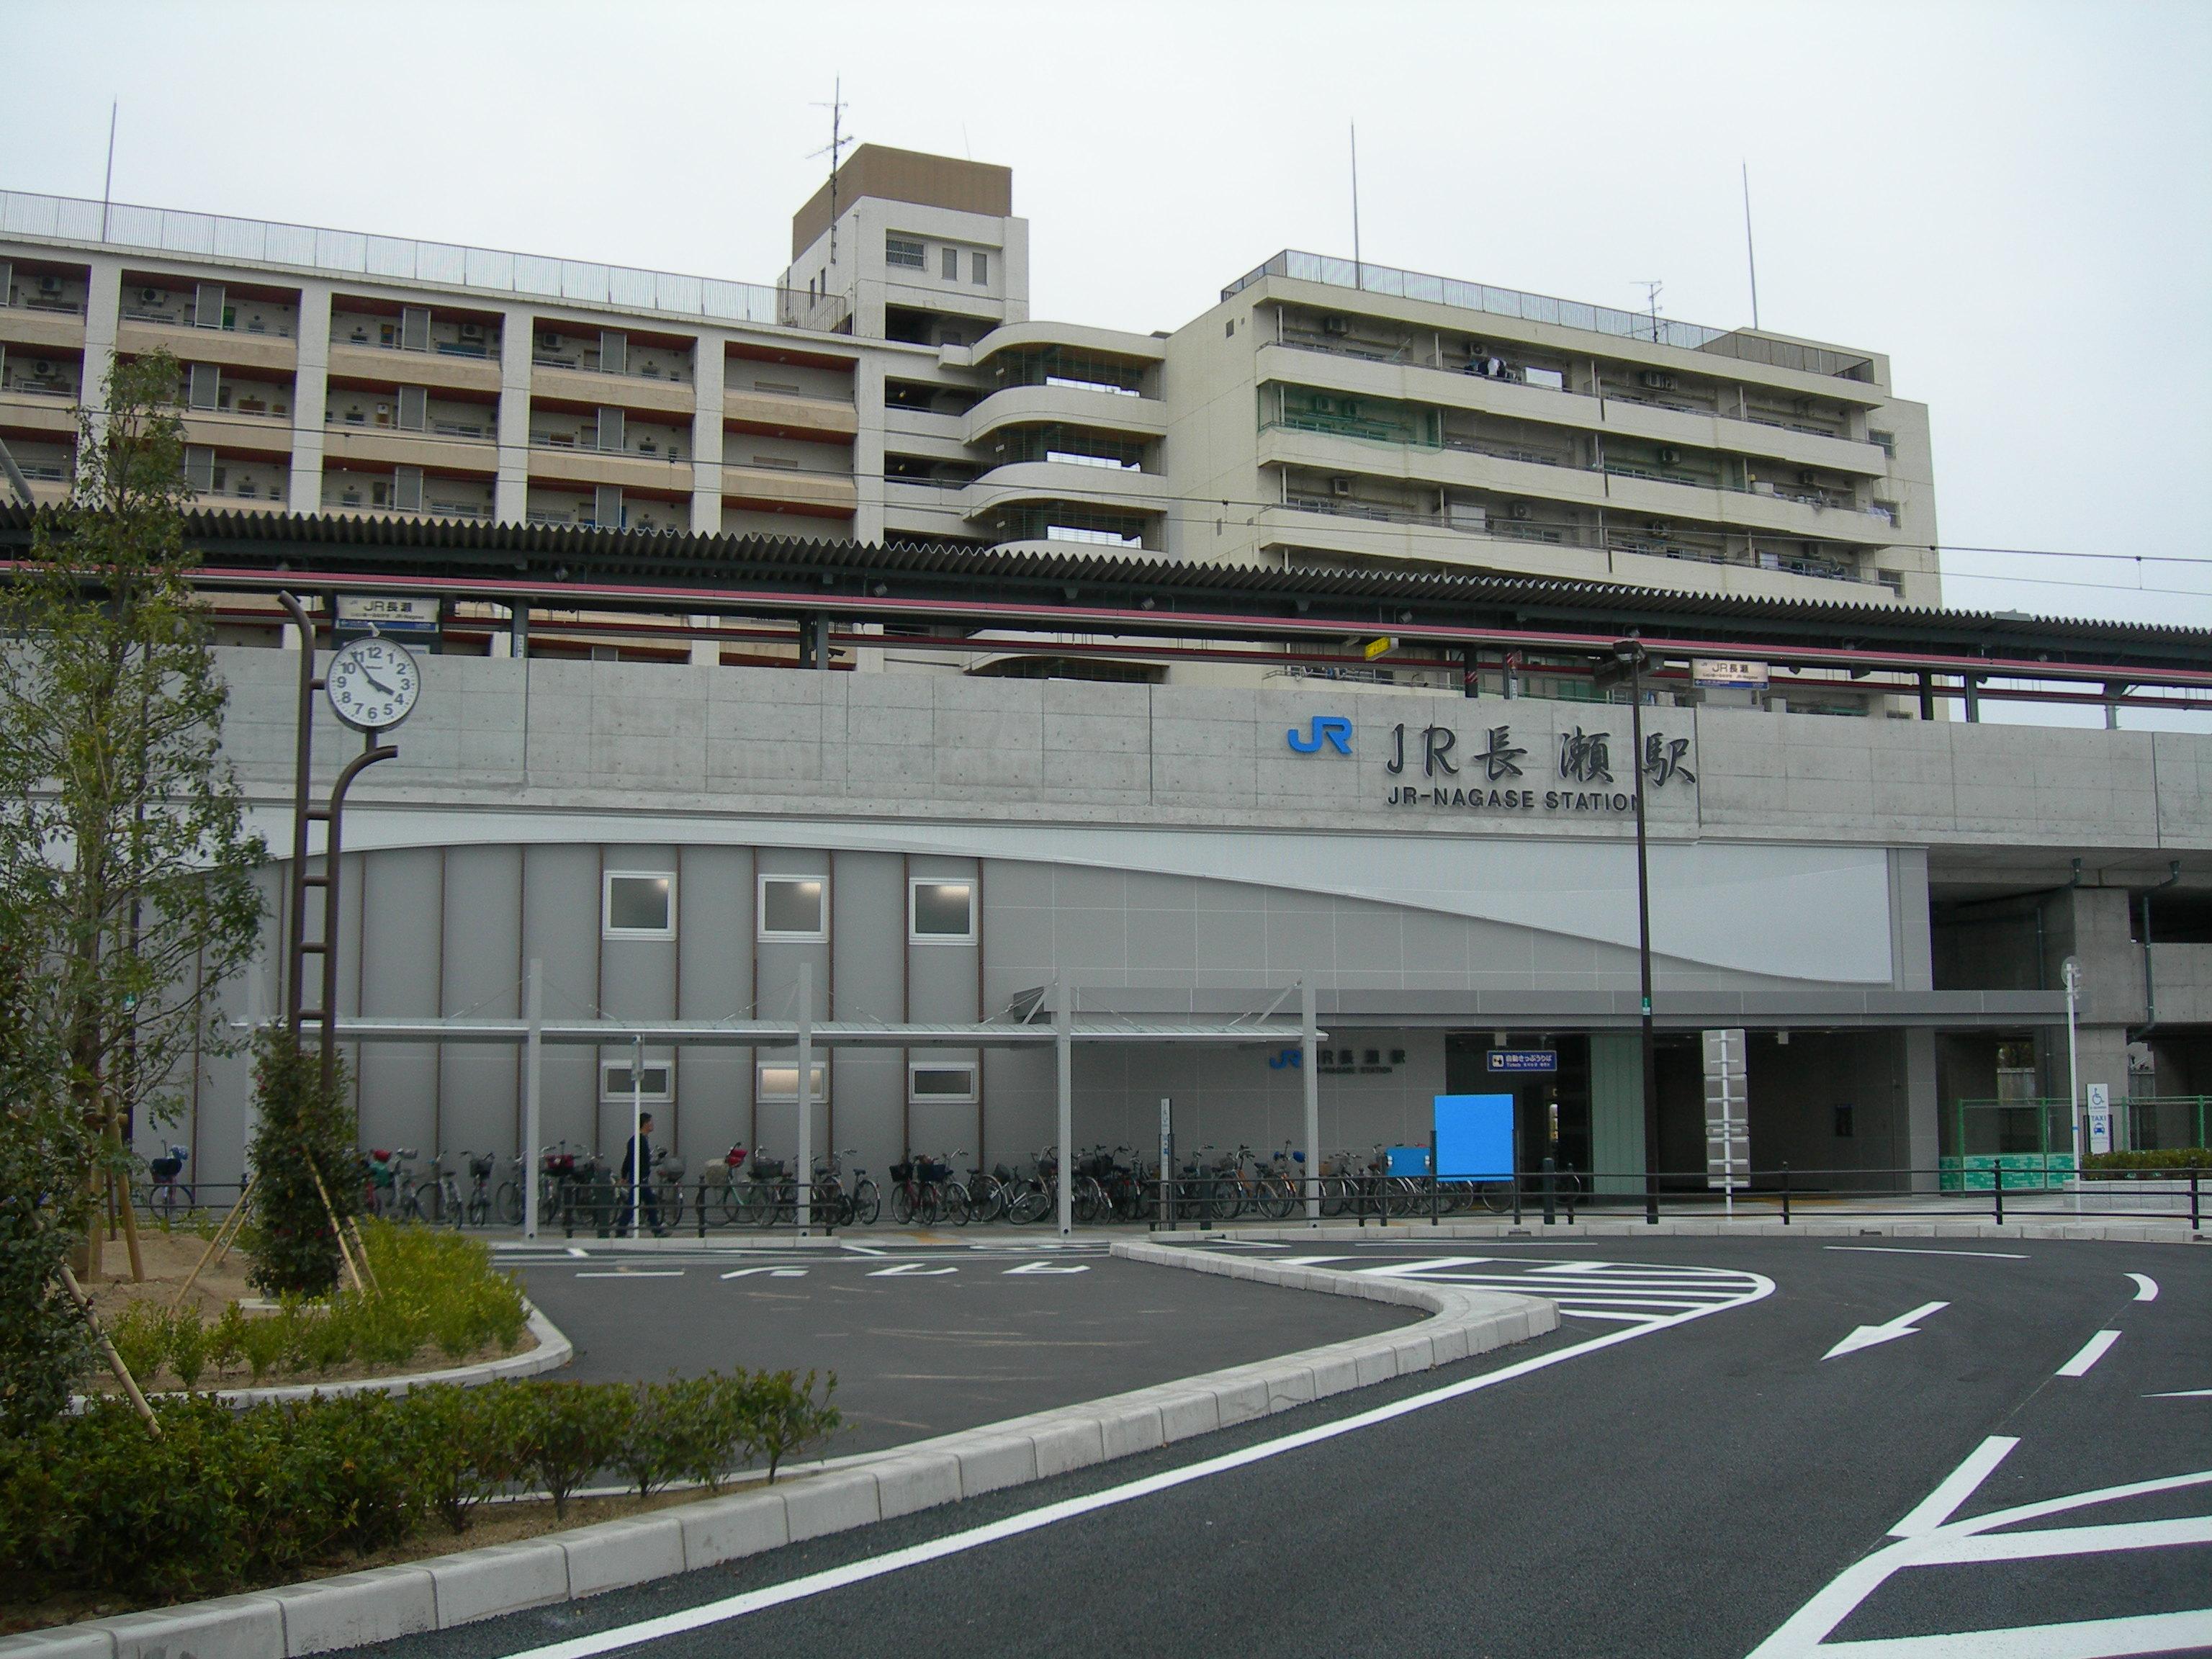 https://upload.wikimedia.org/wikipedia/commons/e/e2/JR-NagaseSt200803.JPG